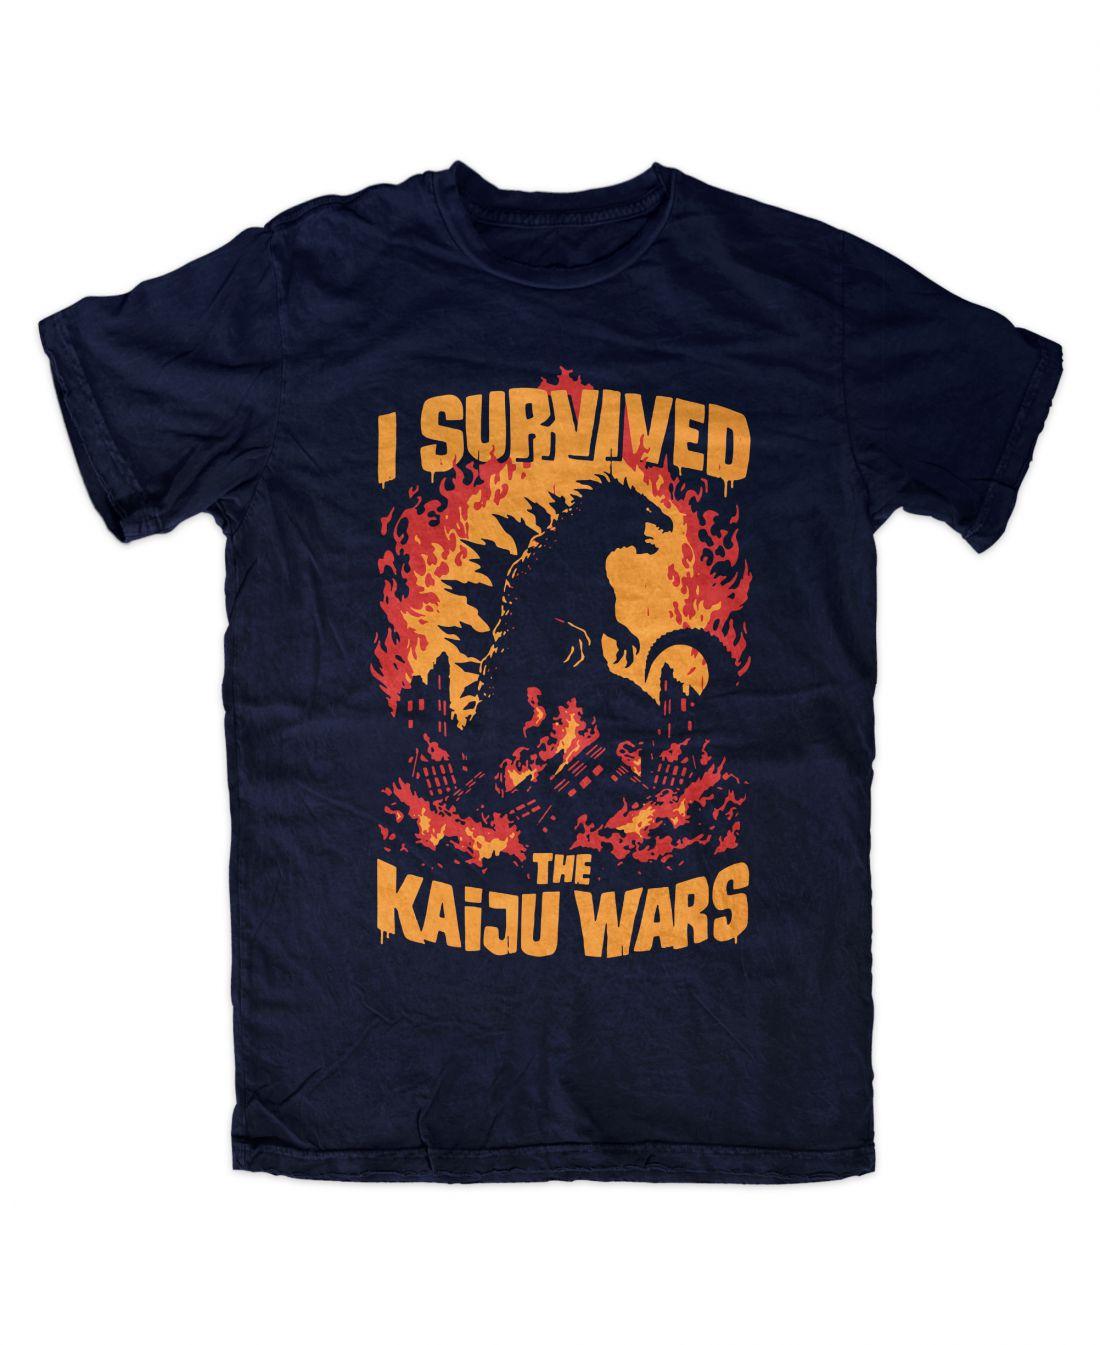 Kaiju Wars (navy blue póló)